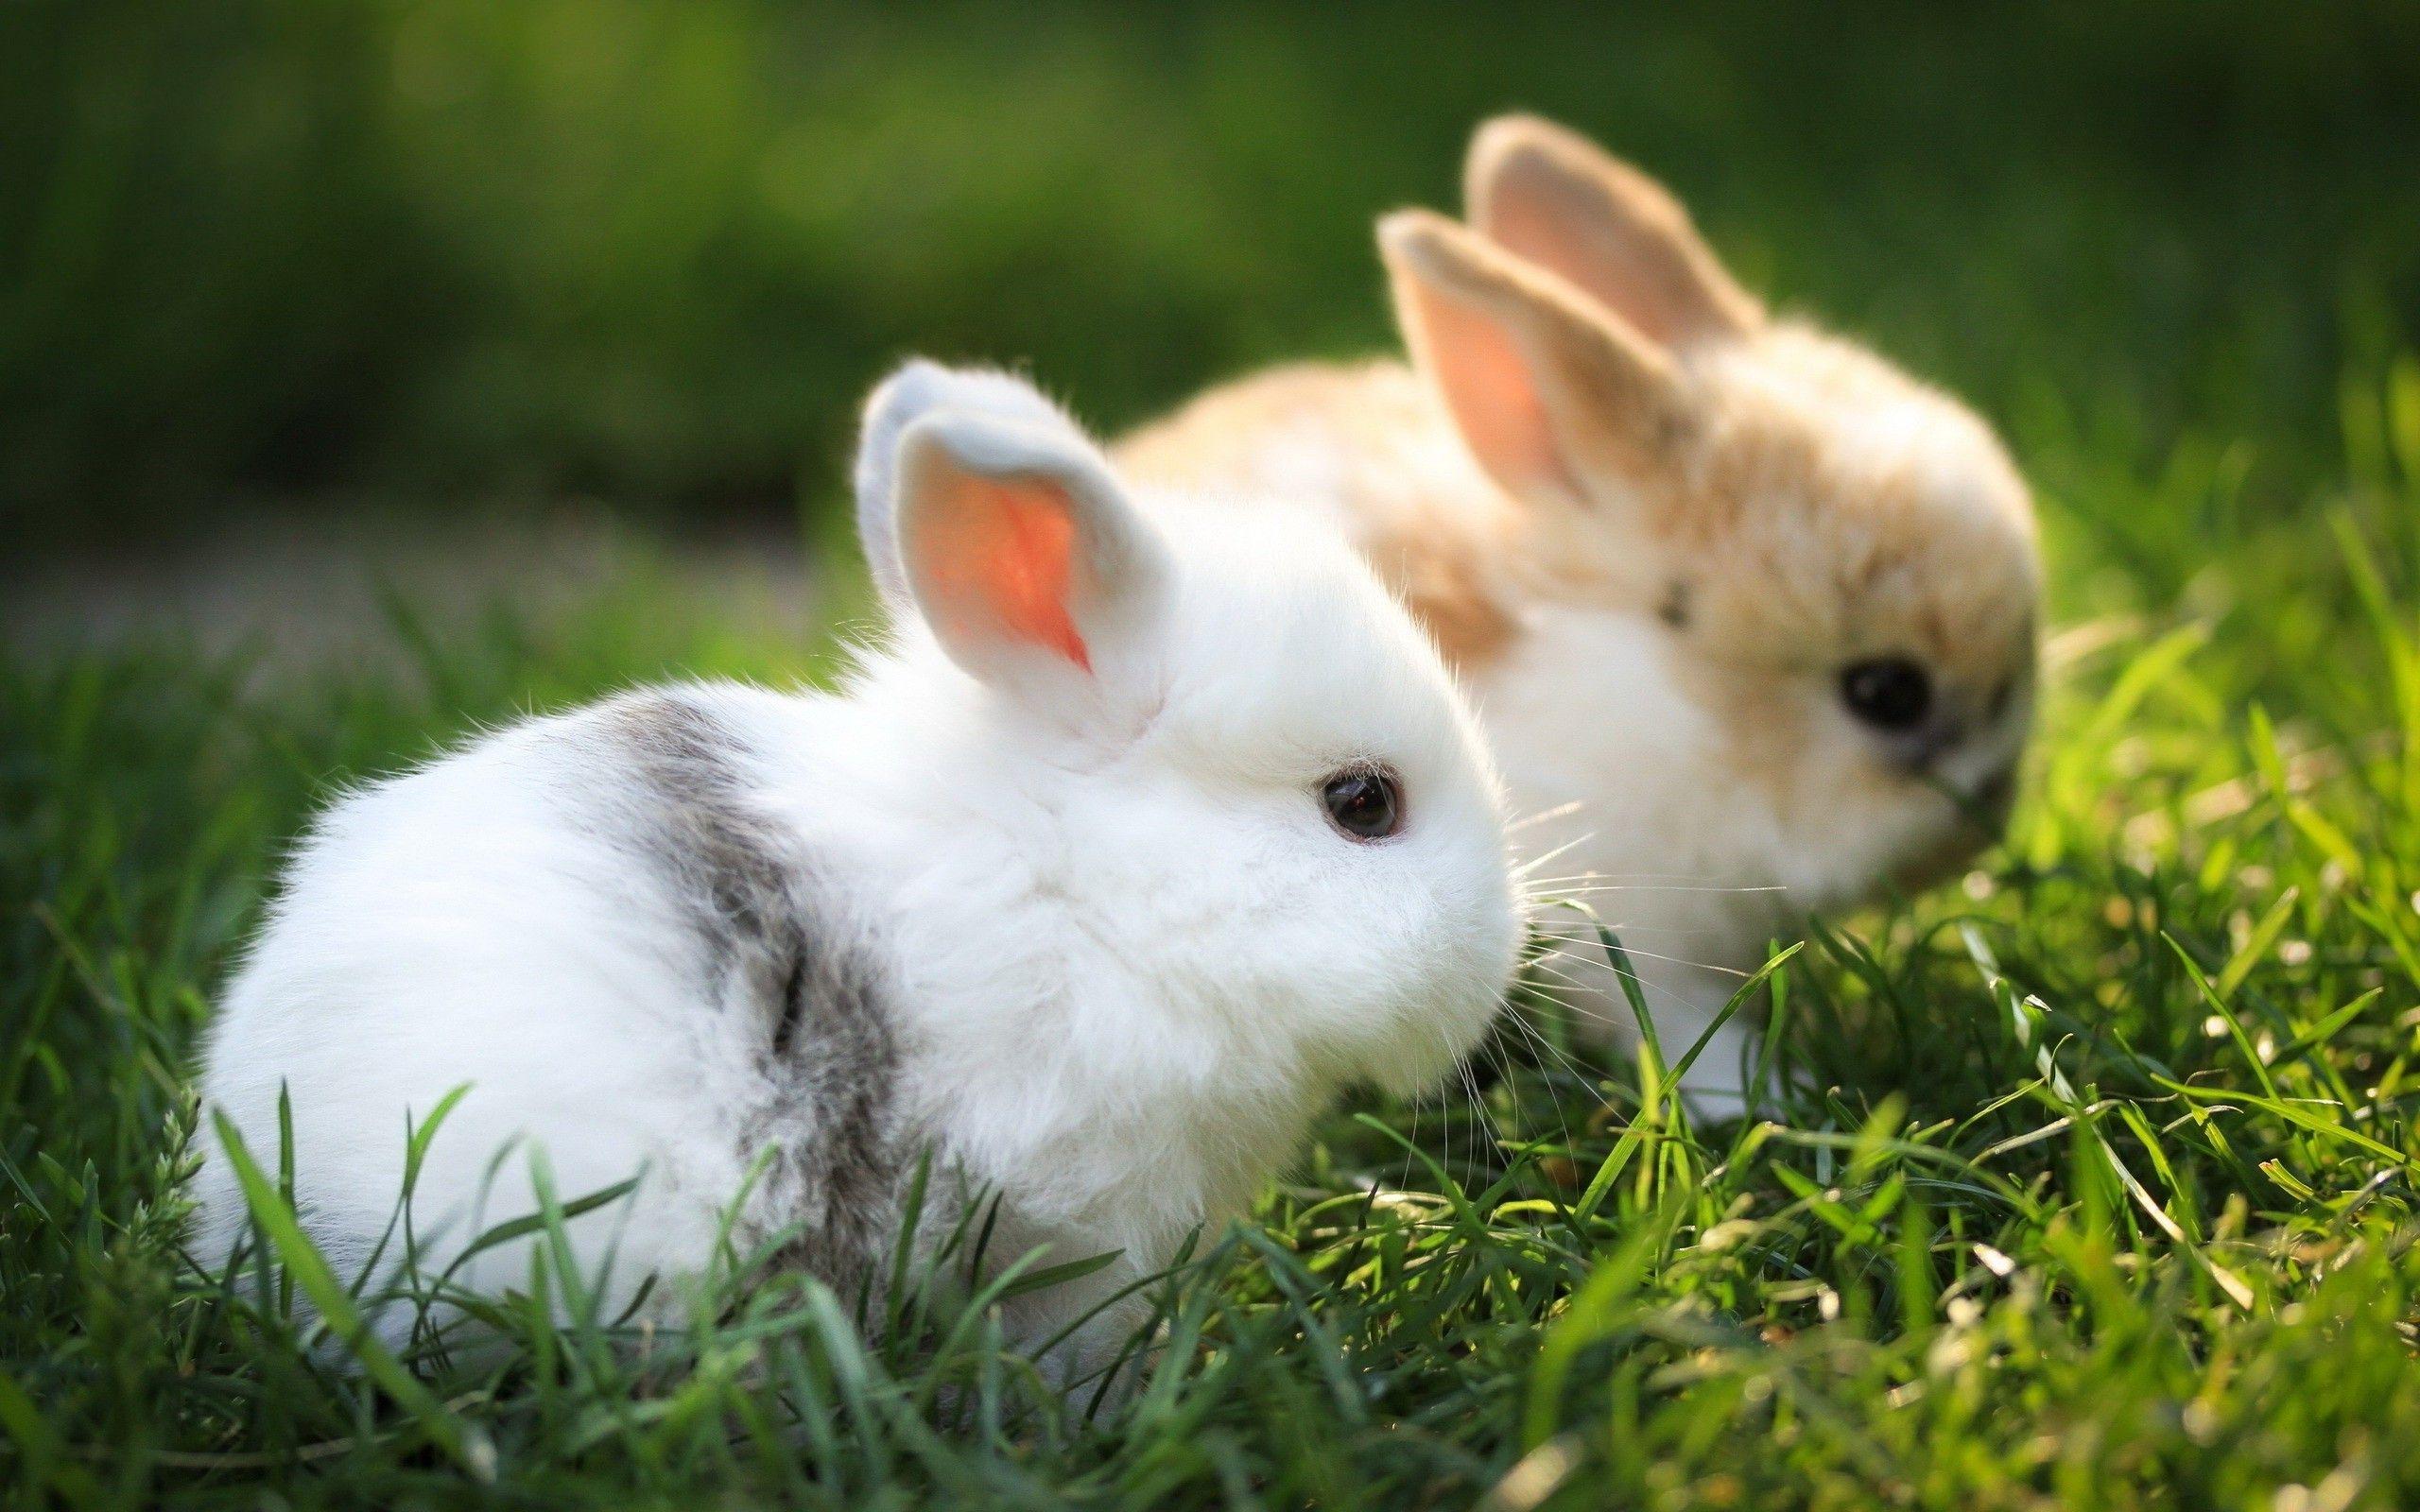 27] Cute White Baby Rabbit Wallpaper on WallpaperSafari 2560x1600